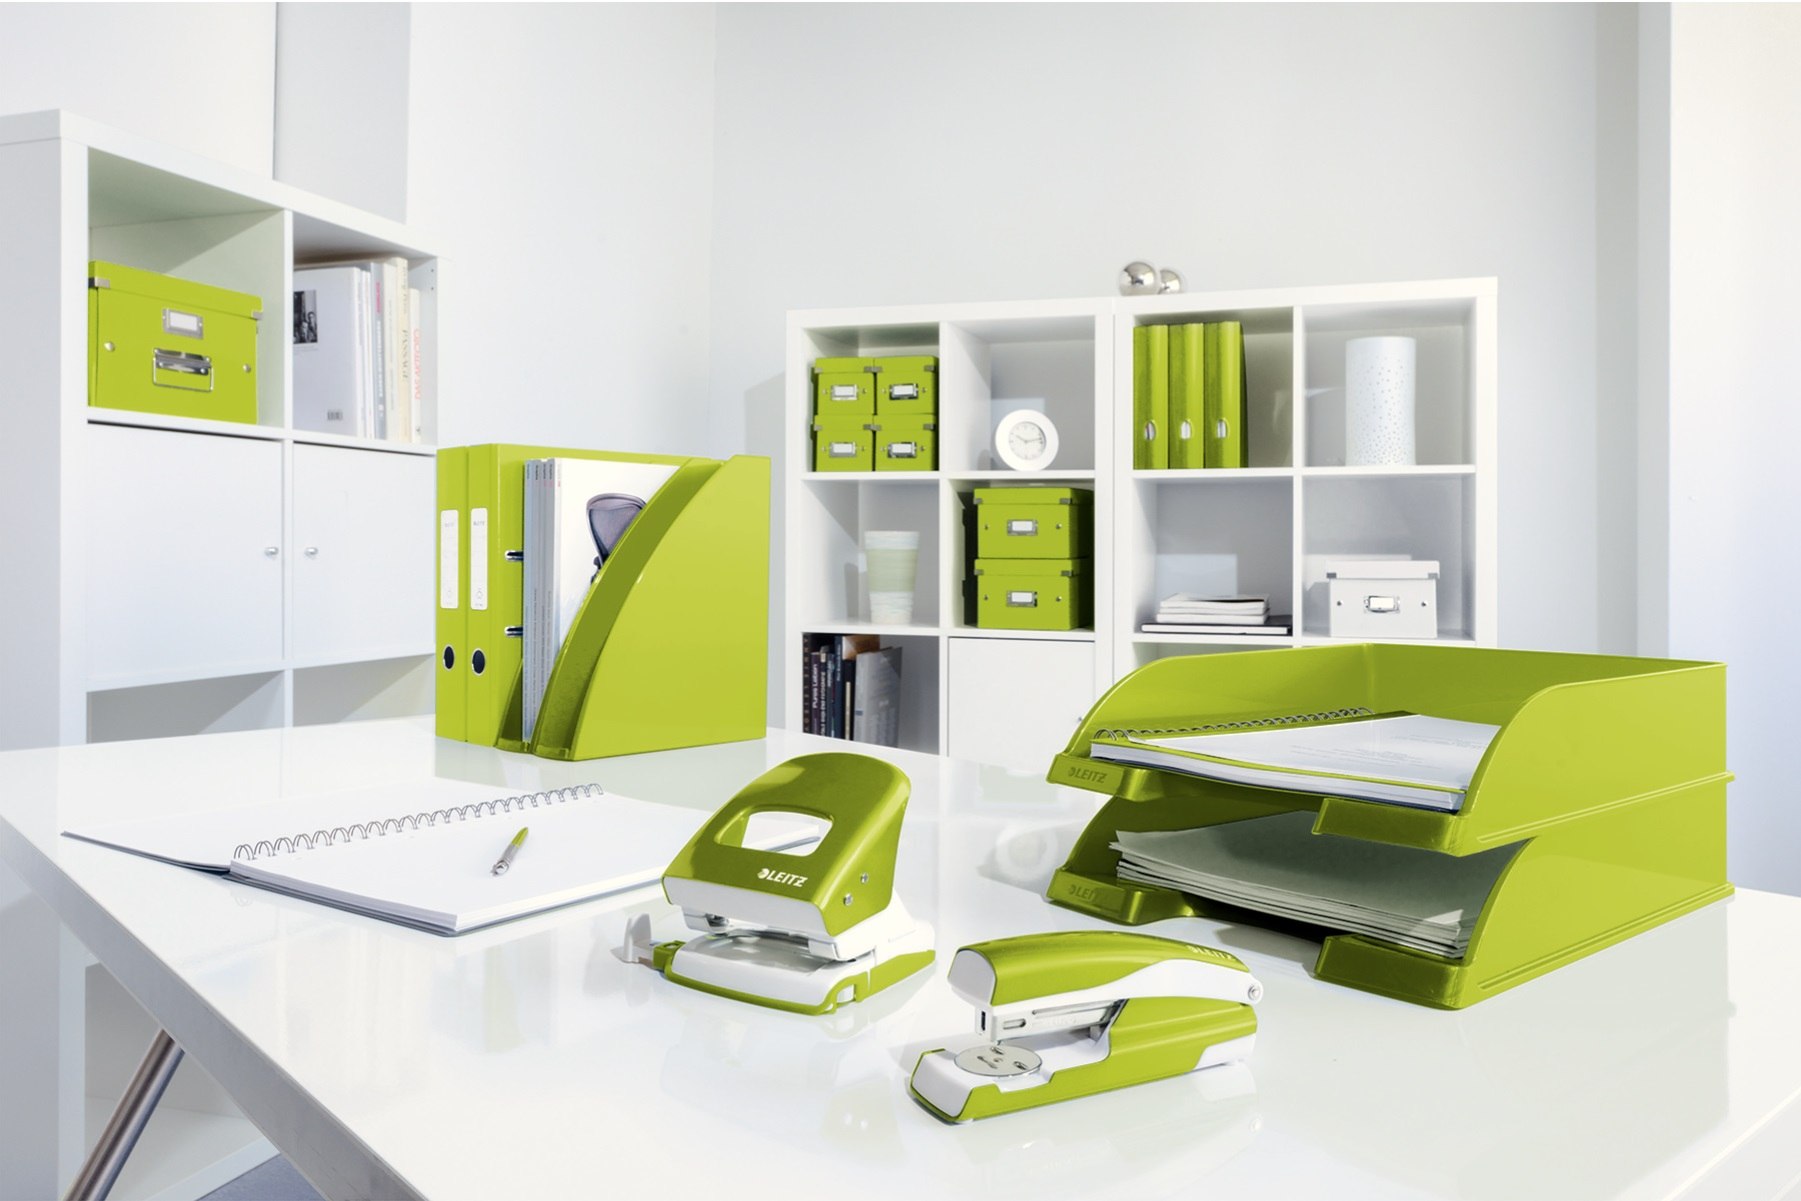 Descriere Capsator metalic de birou, pentru maxim 30 coli, capse 24/6, verde metalizat, LEITZ 5502 NeXXt Series